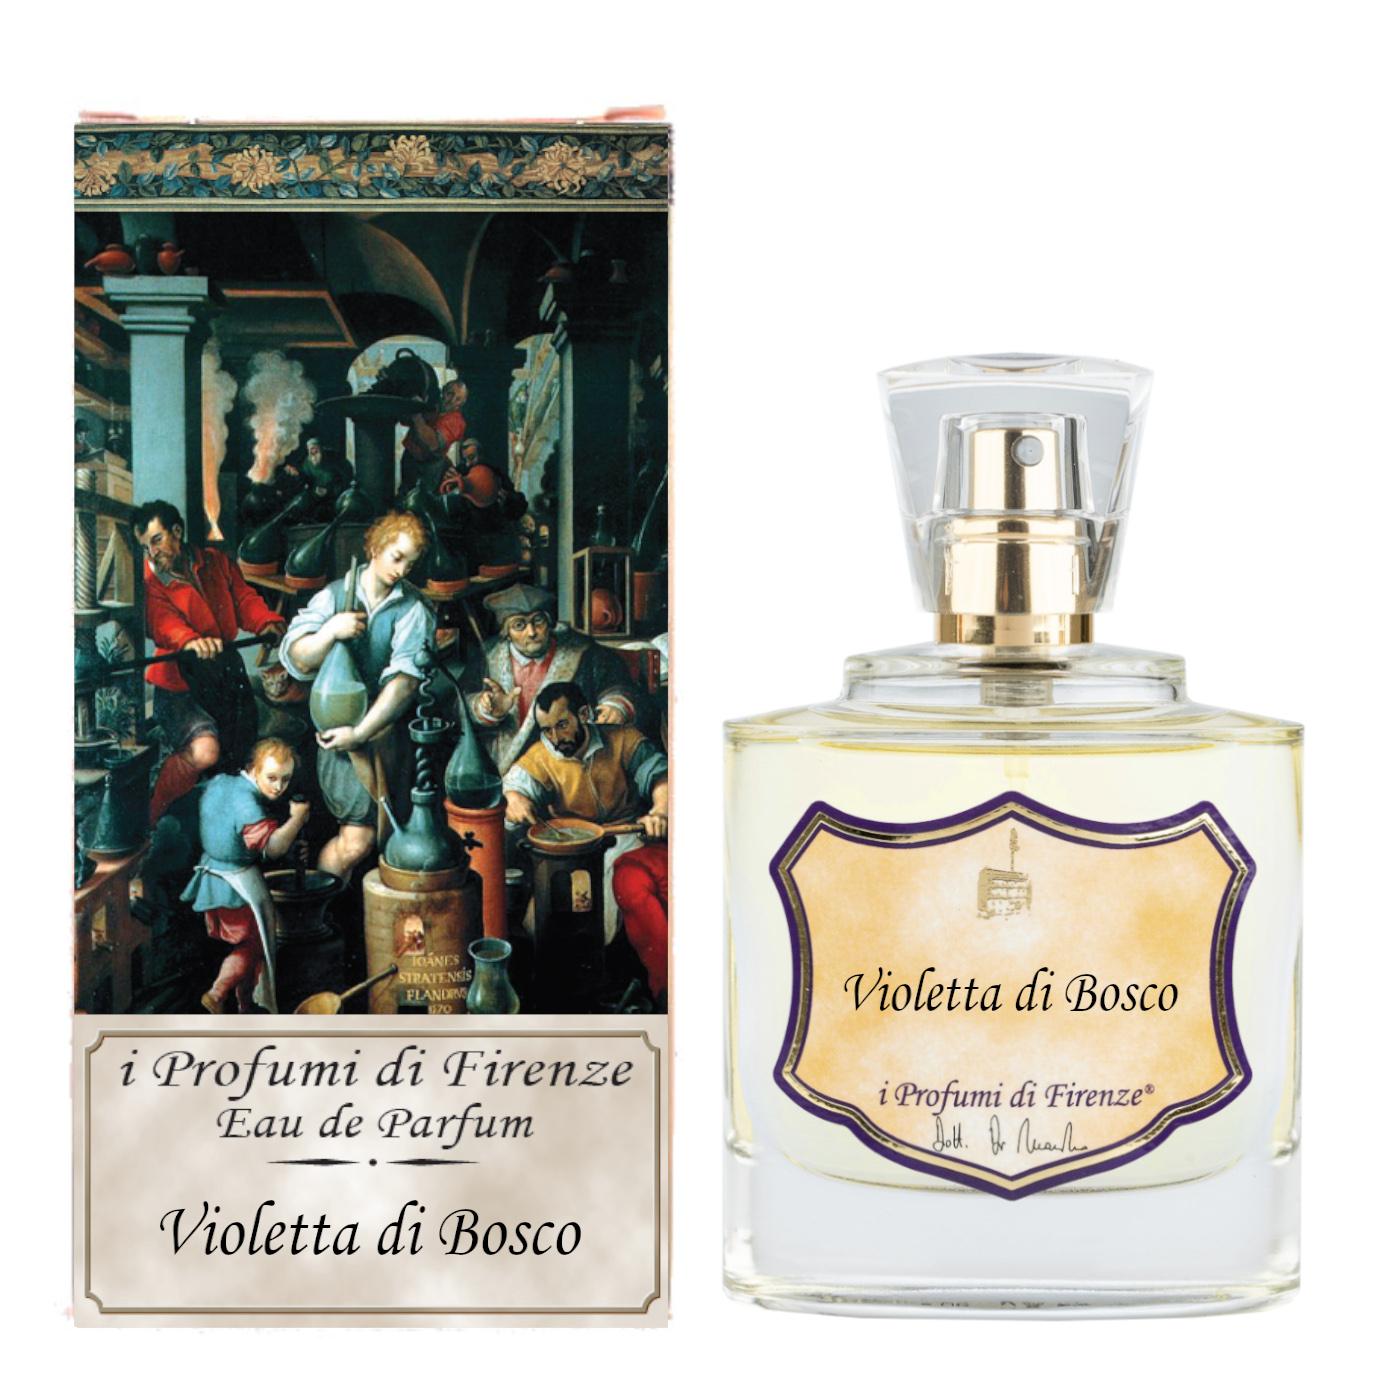 VIOLETTA DI BOSCO - Eau de Parfum-4085